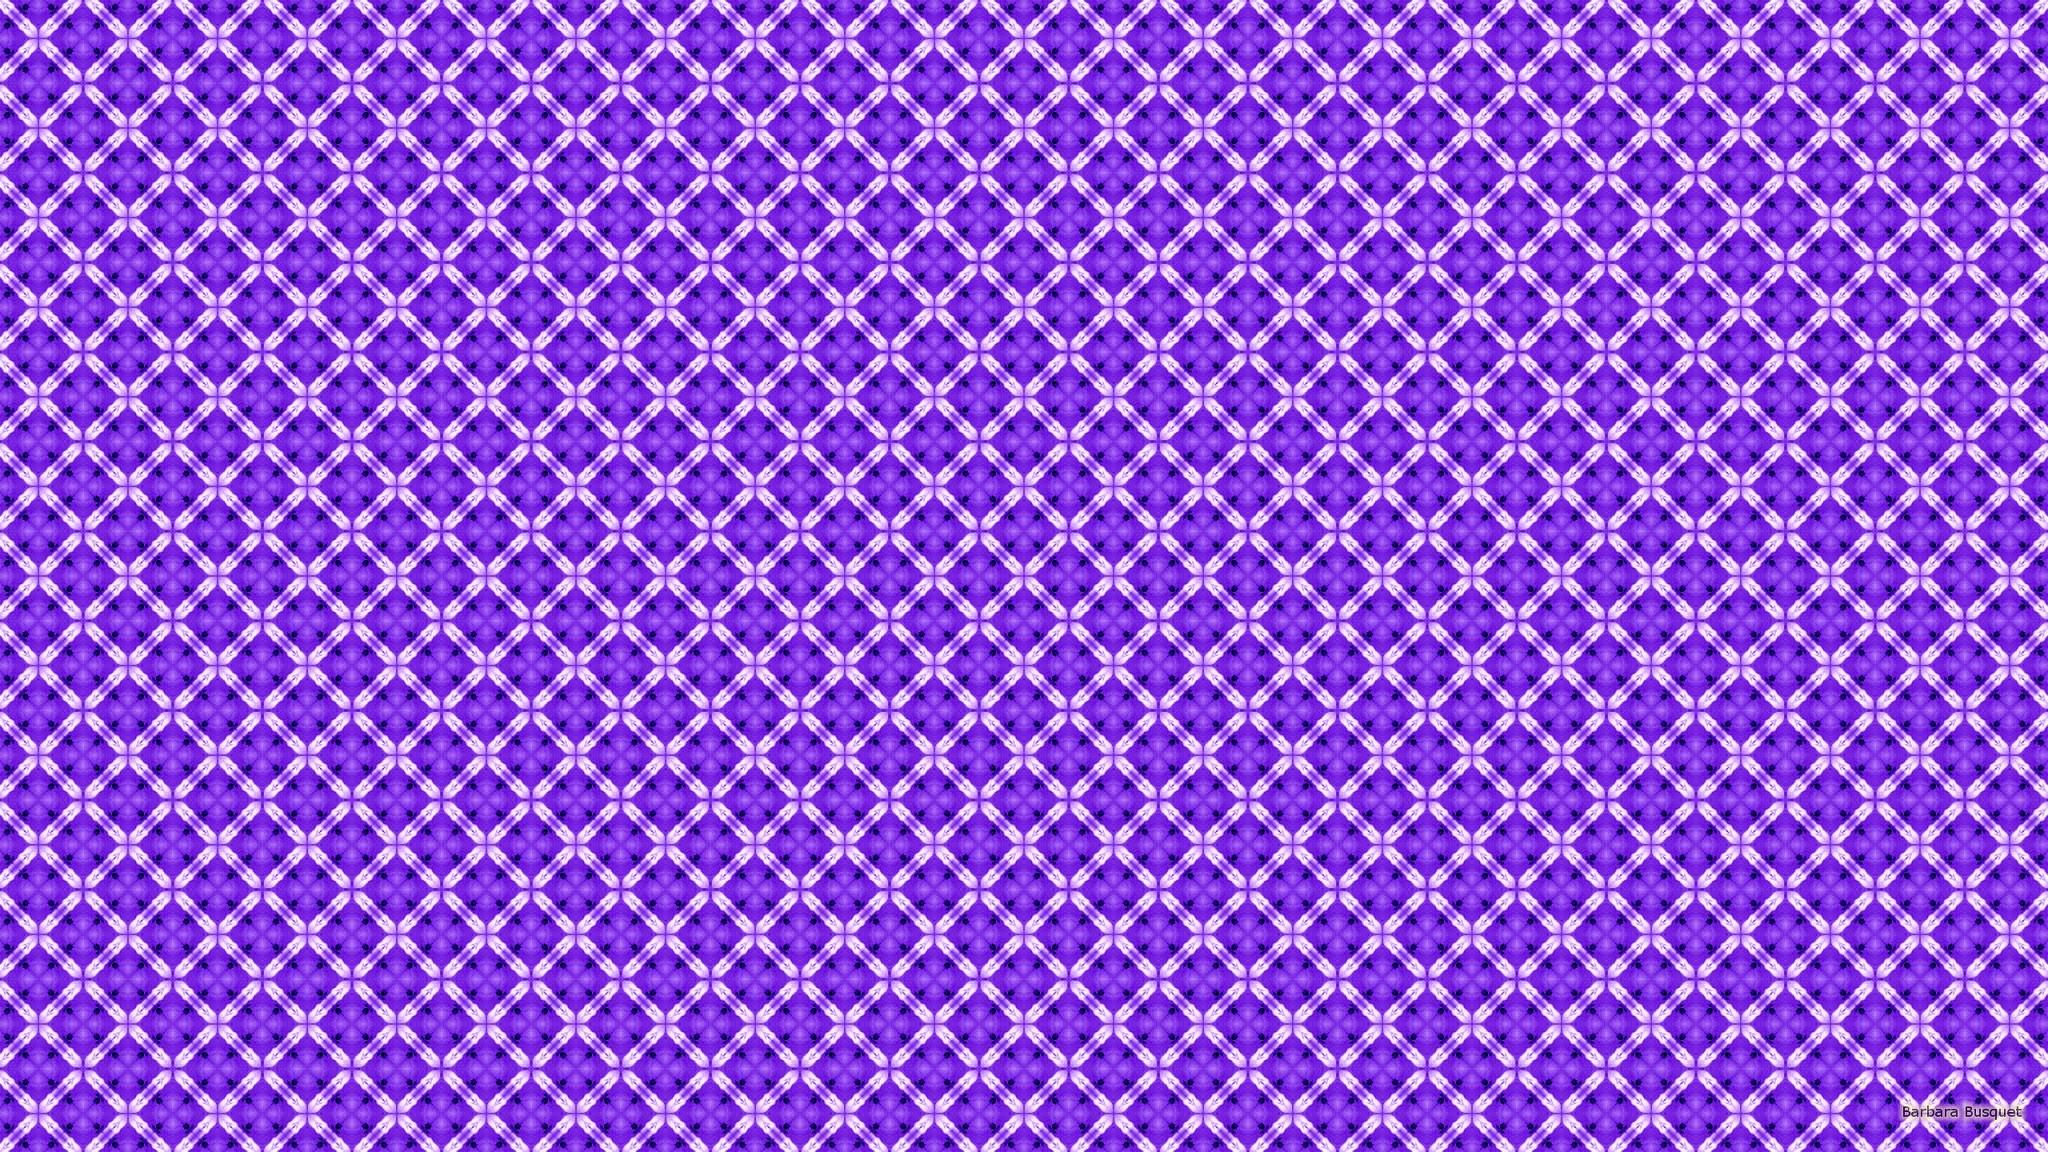 Purple pattern | Barbara's HD Wallpapers - photo#45